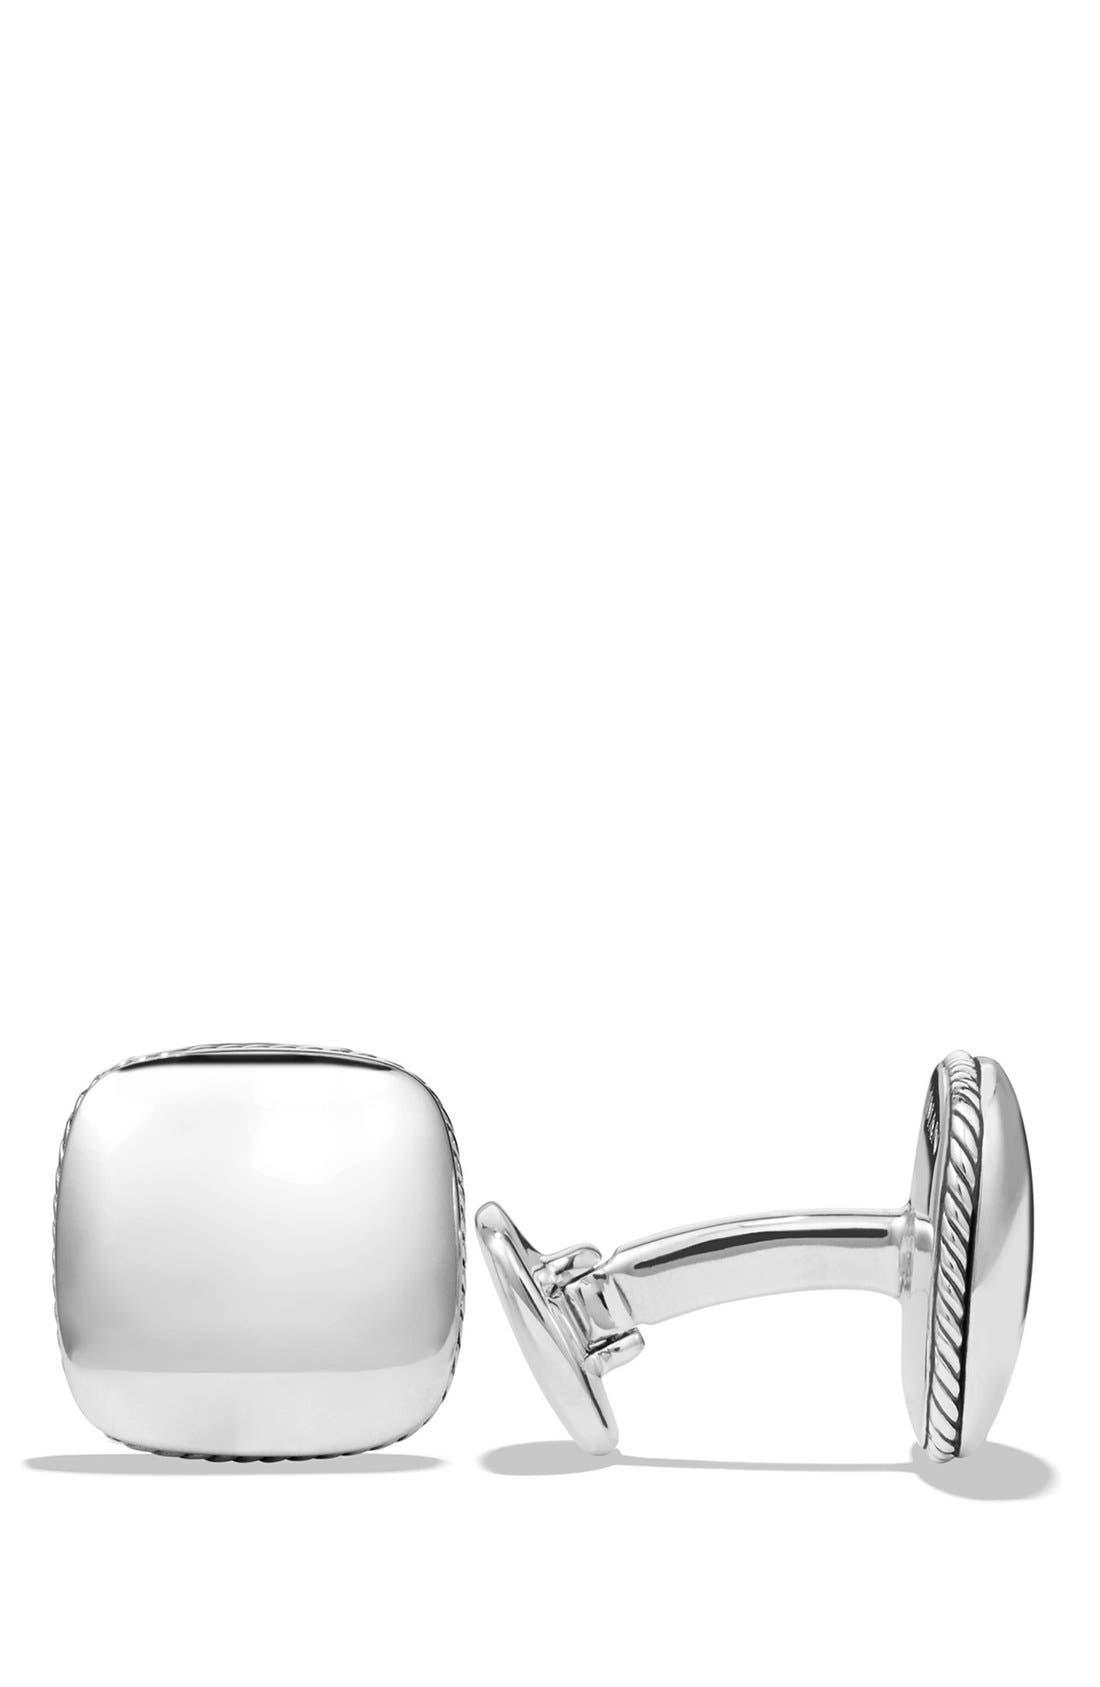 'Streamline' Cuff links,                         Main,                         color, Silver